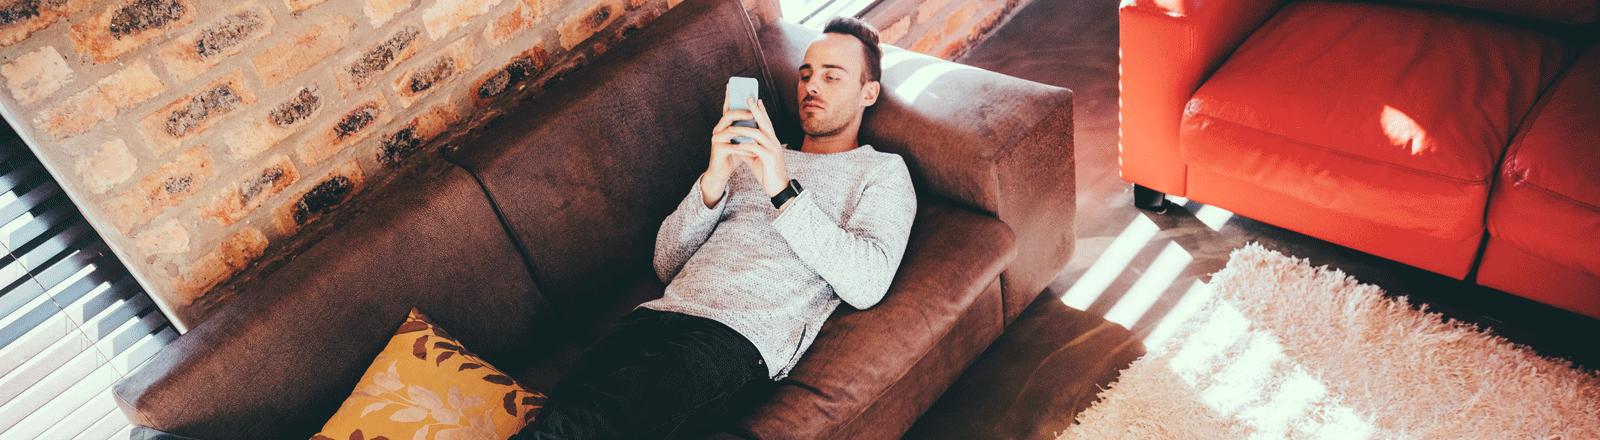 Mann auf Sofa